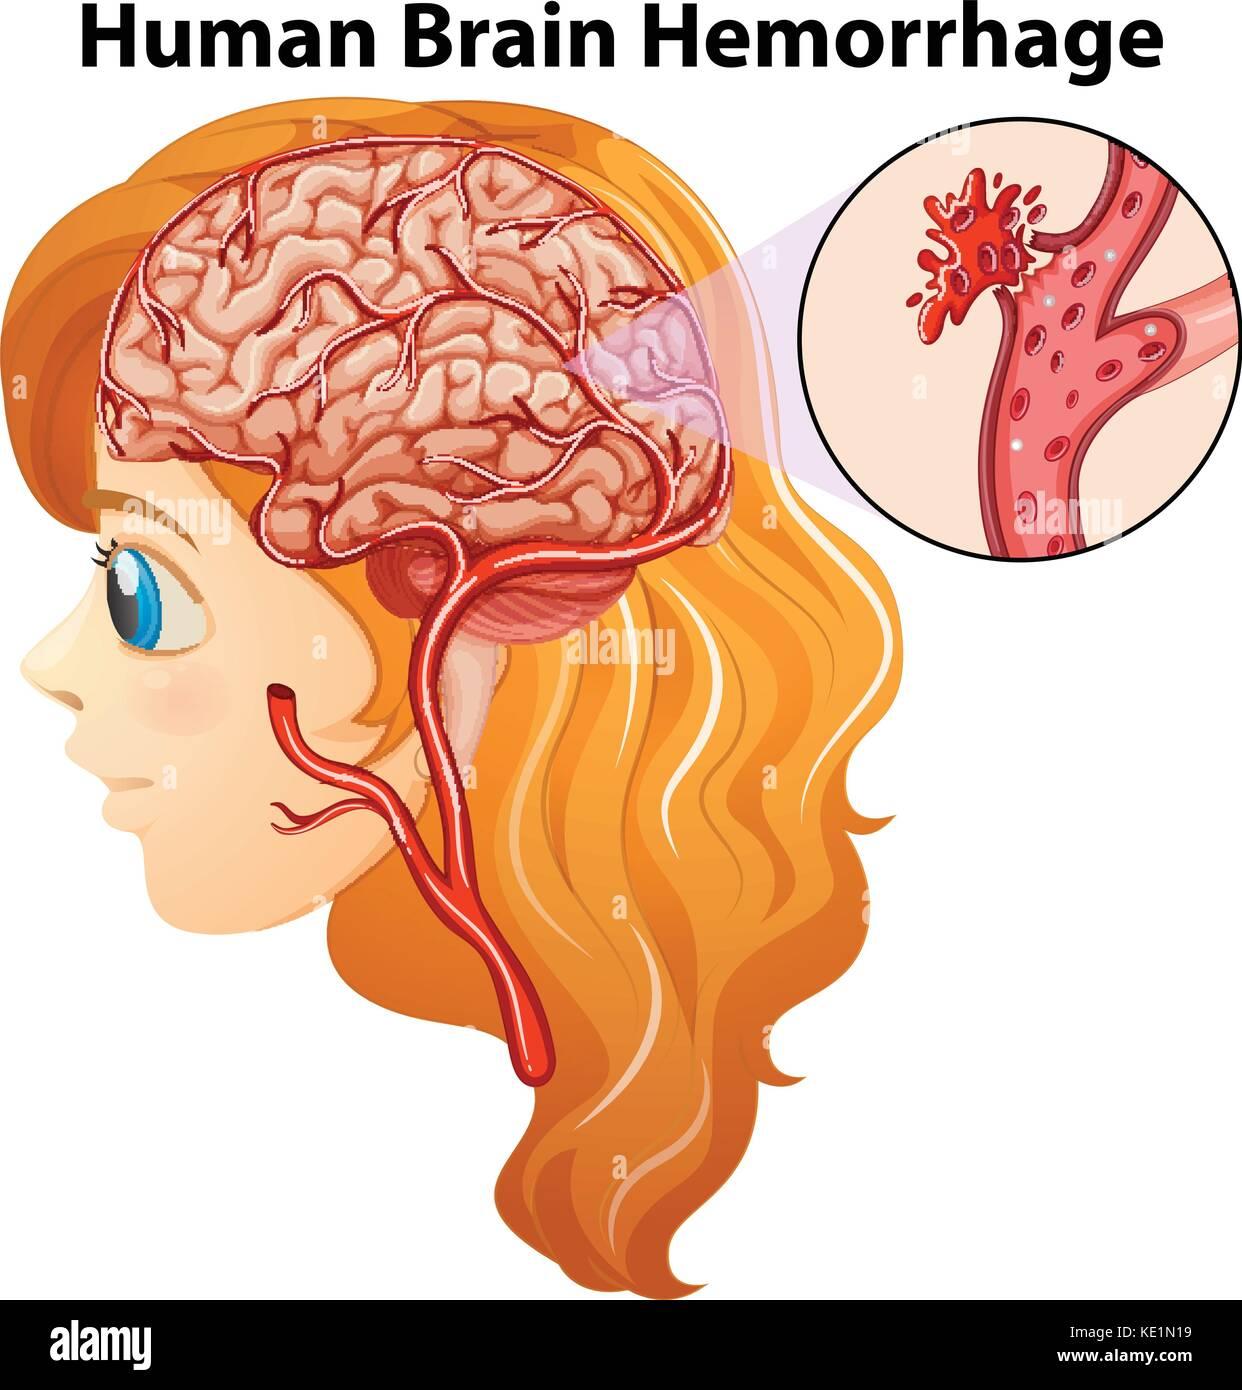 hight resolution of diagram showing human brain hemorrhage illustration stock image